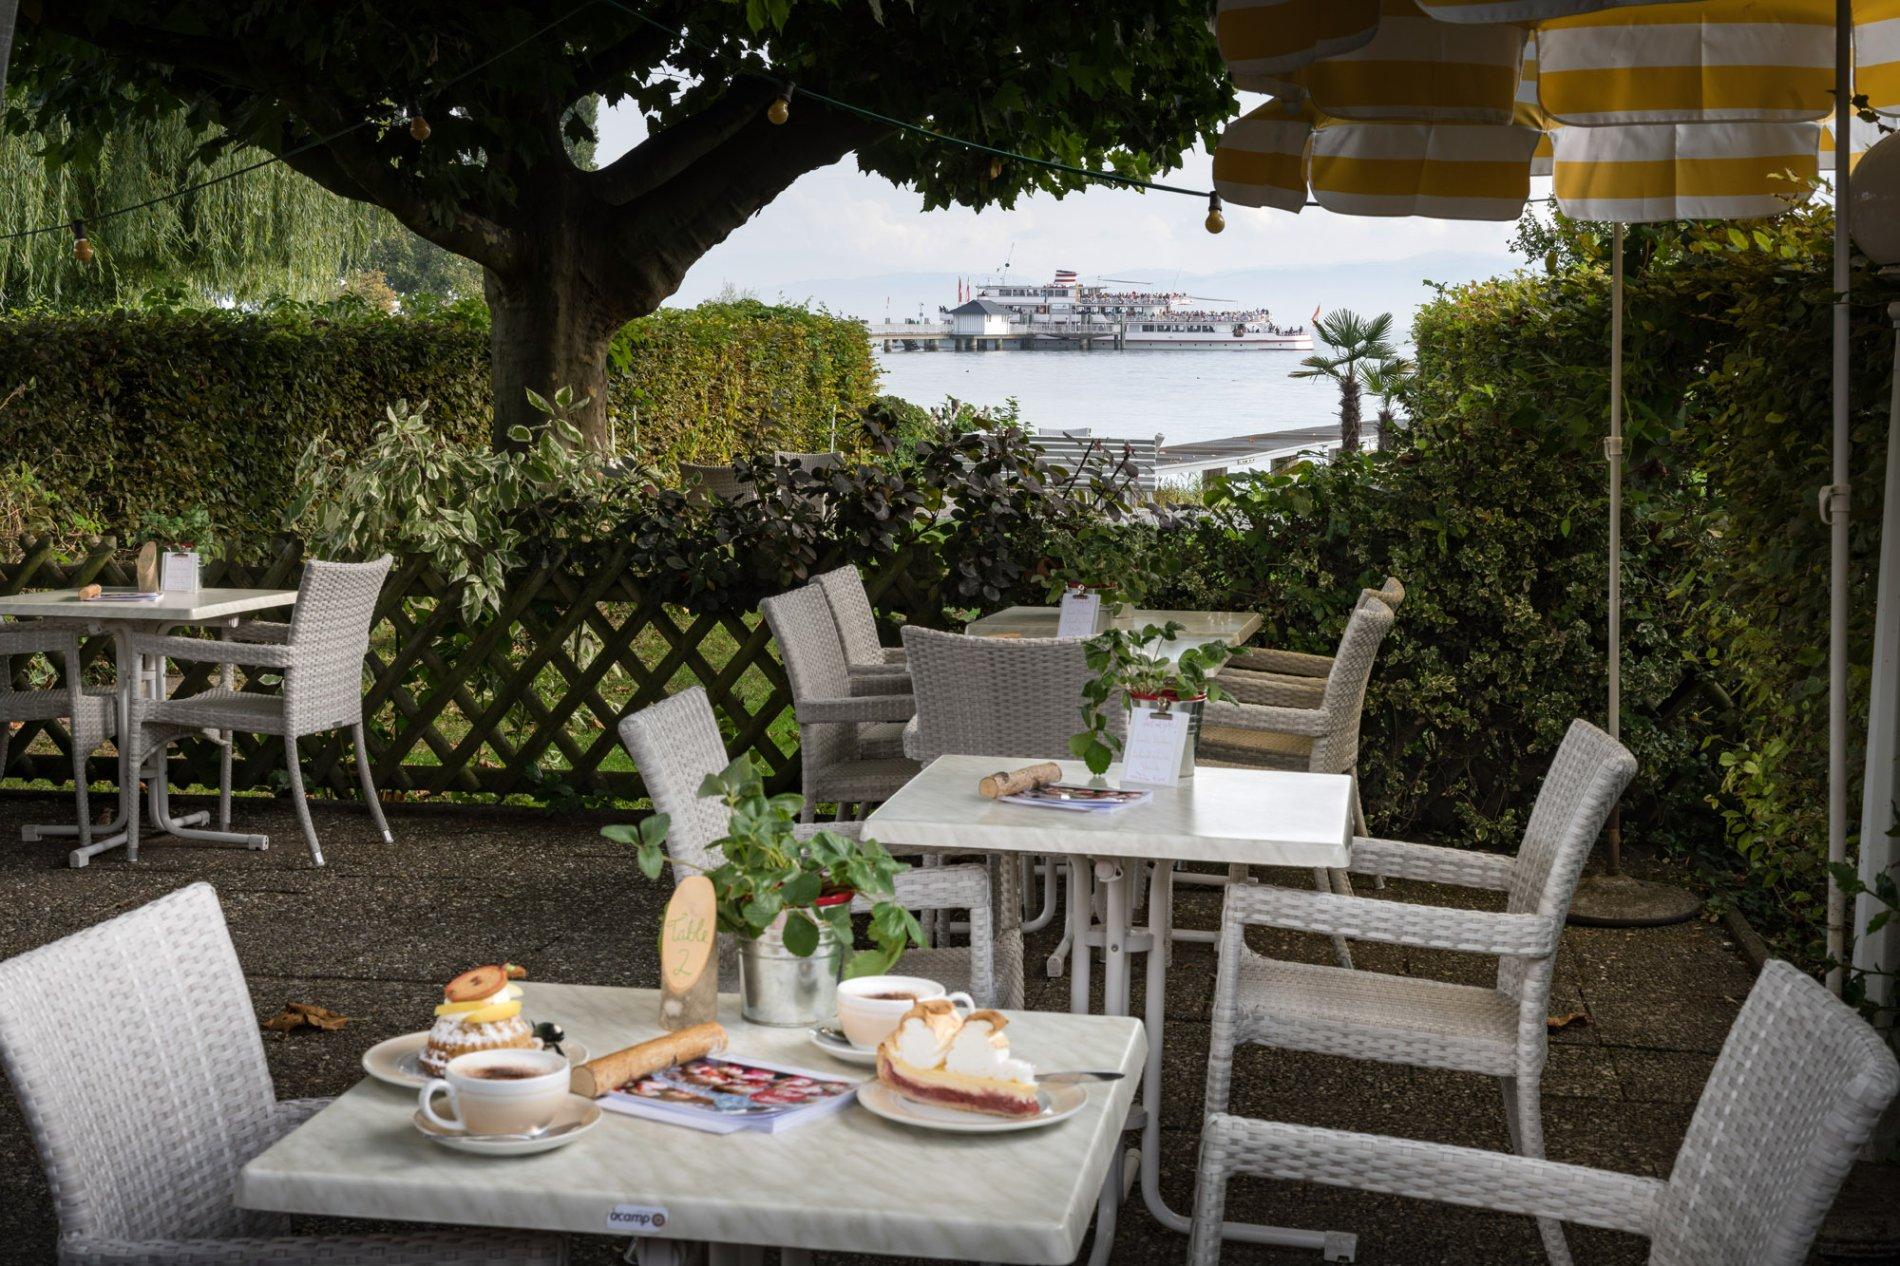 Gartenbereich Cafe Merk